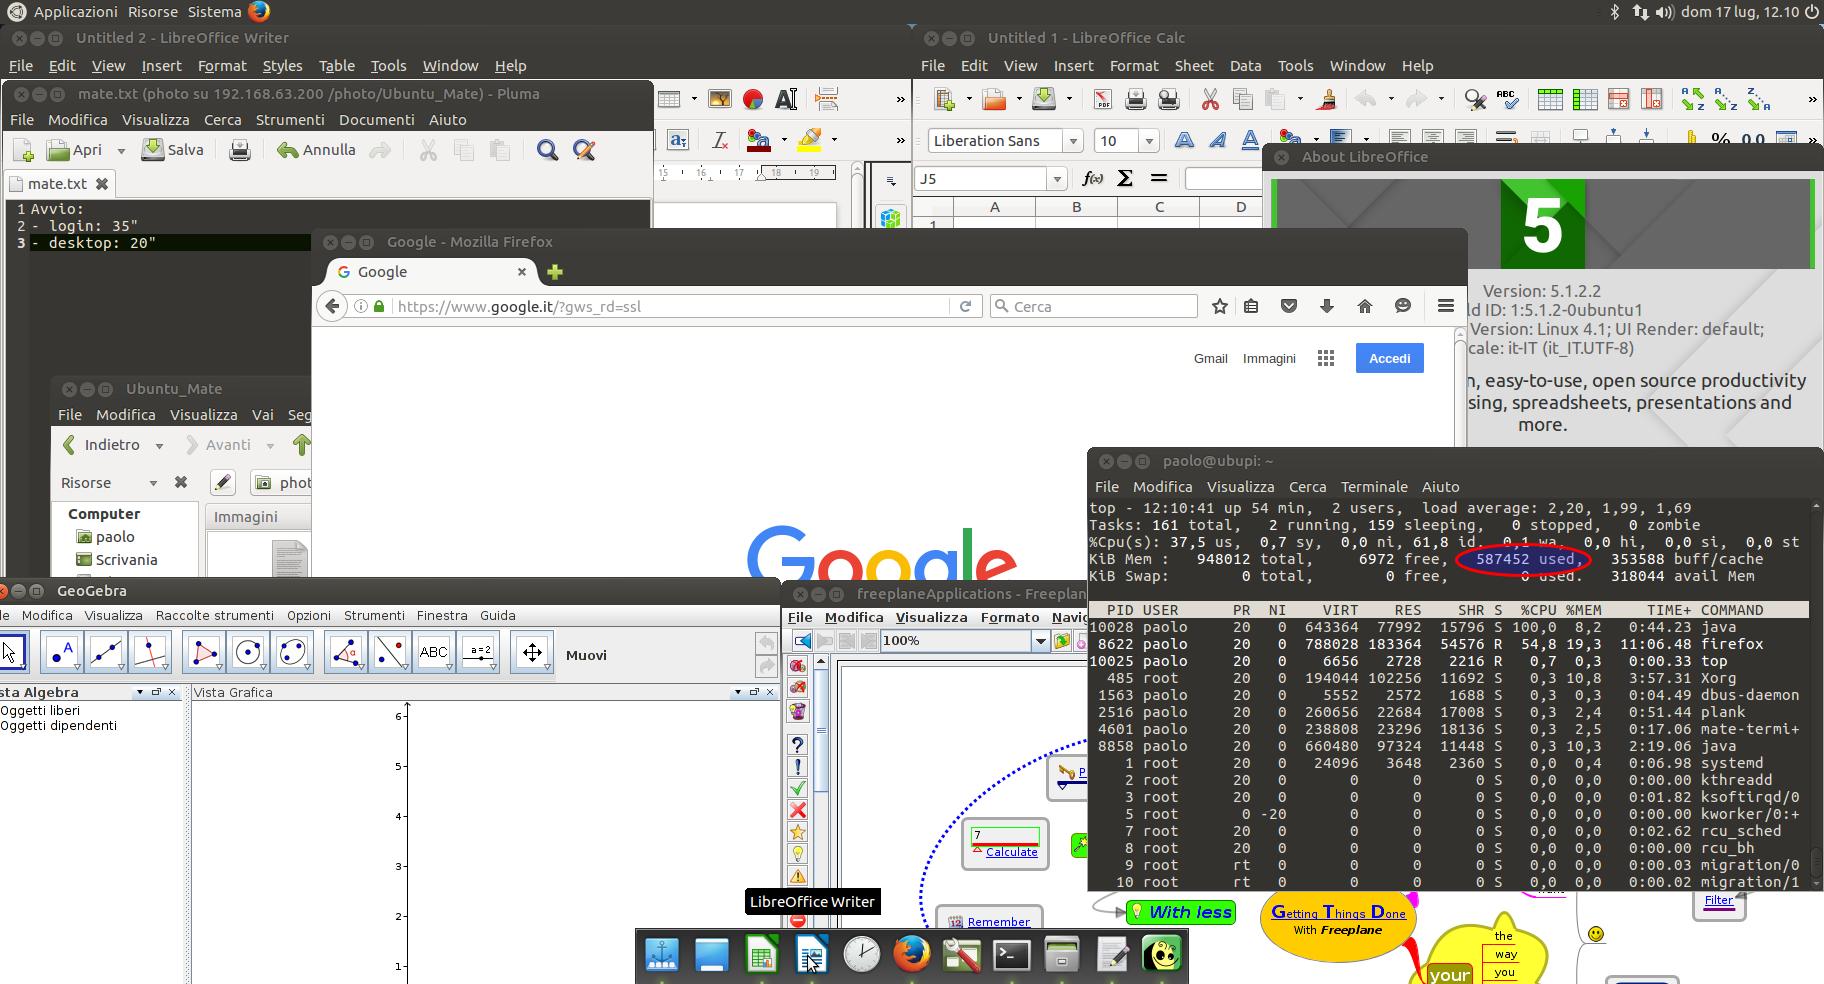 raspberry pi ubuntu mate ram 8 app